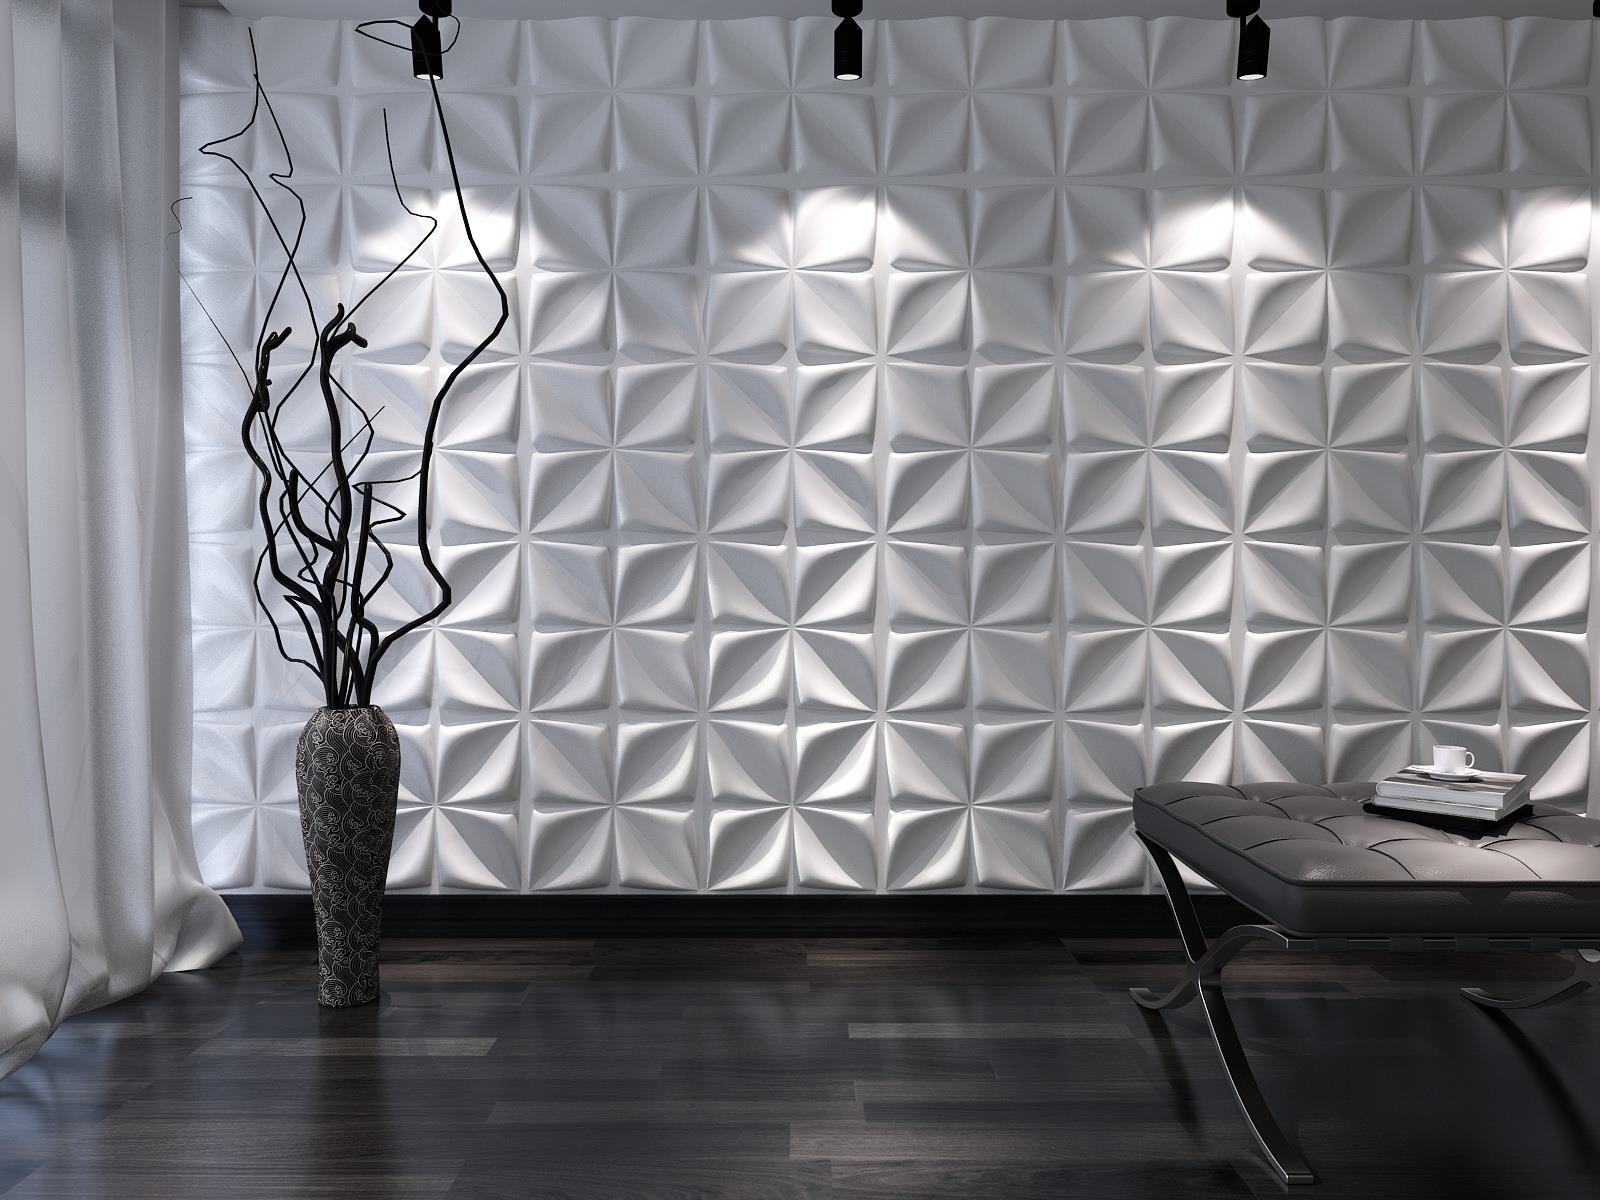 3D Wall Decor Panels Uk.  (Image 5 of 20)